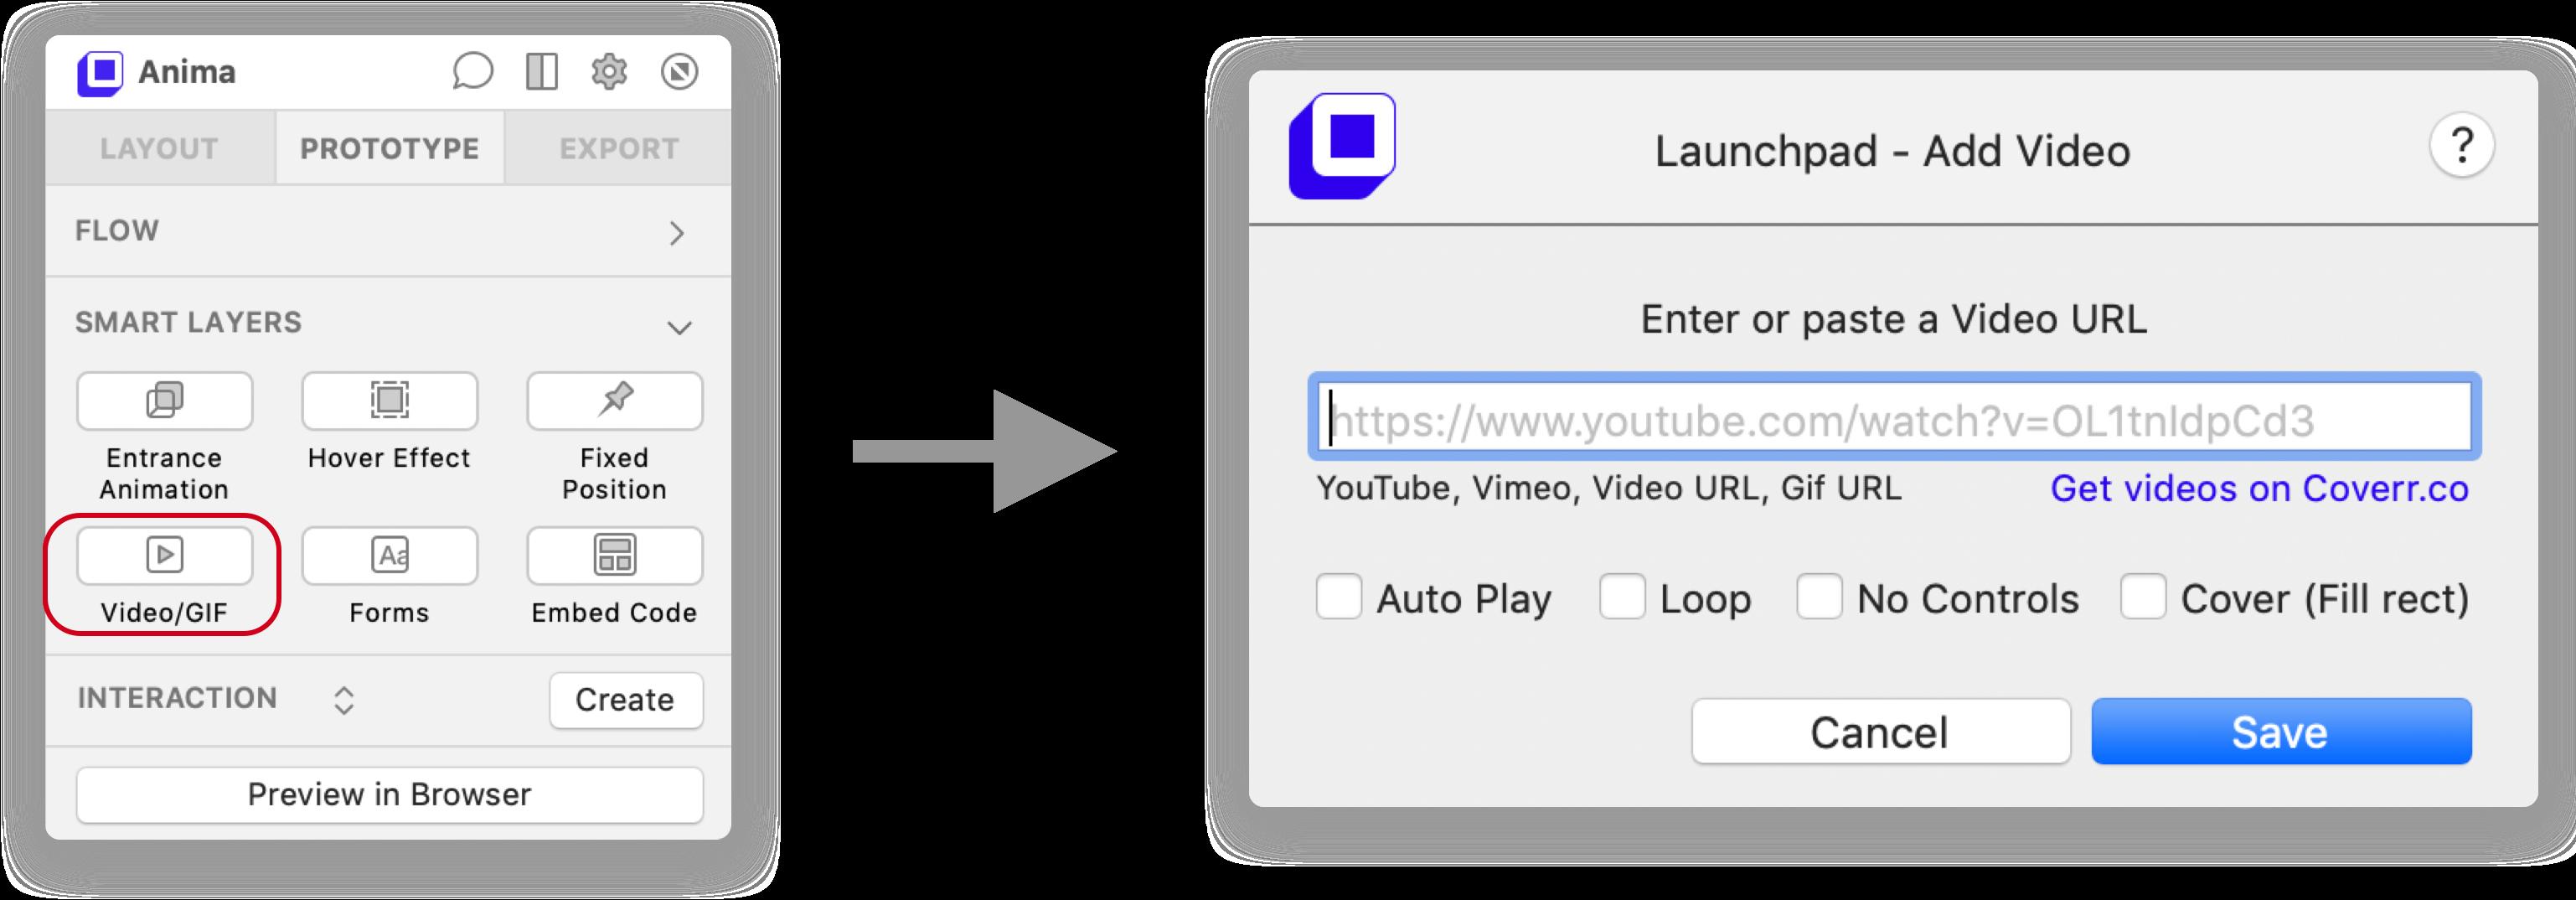 Video/GIF Interface